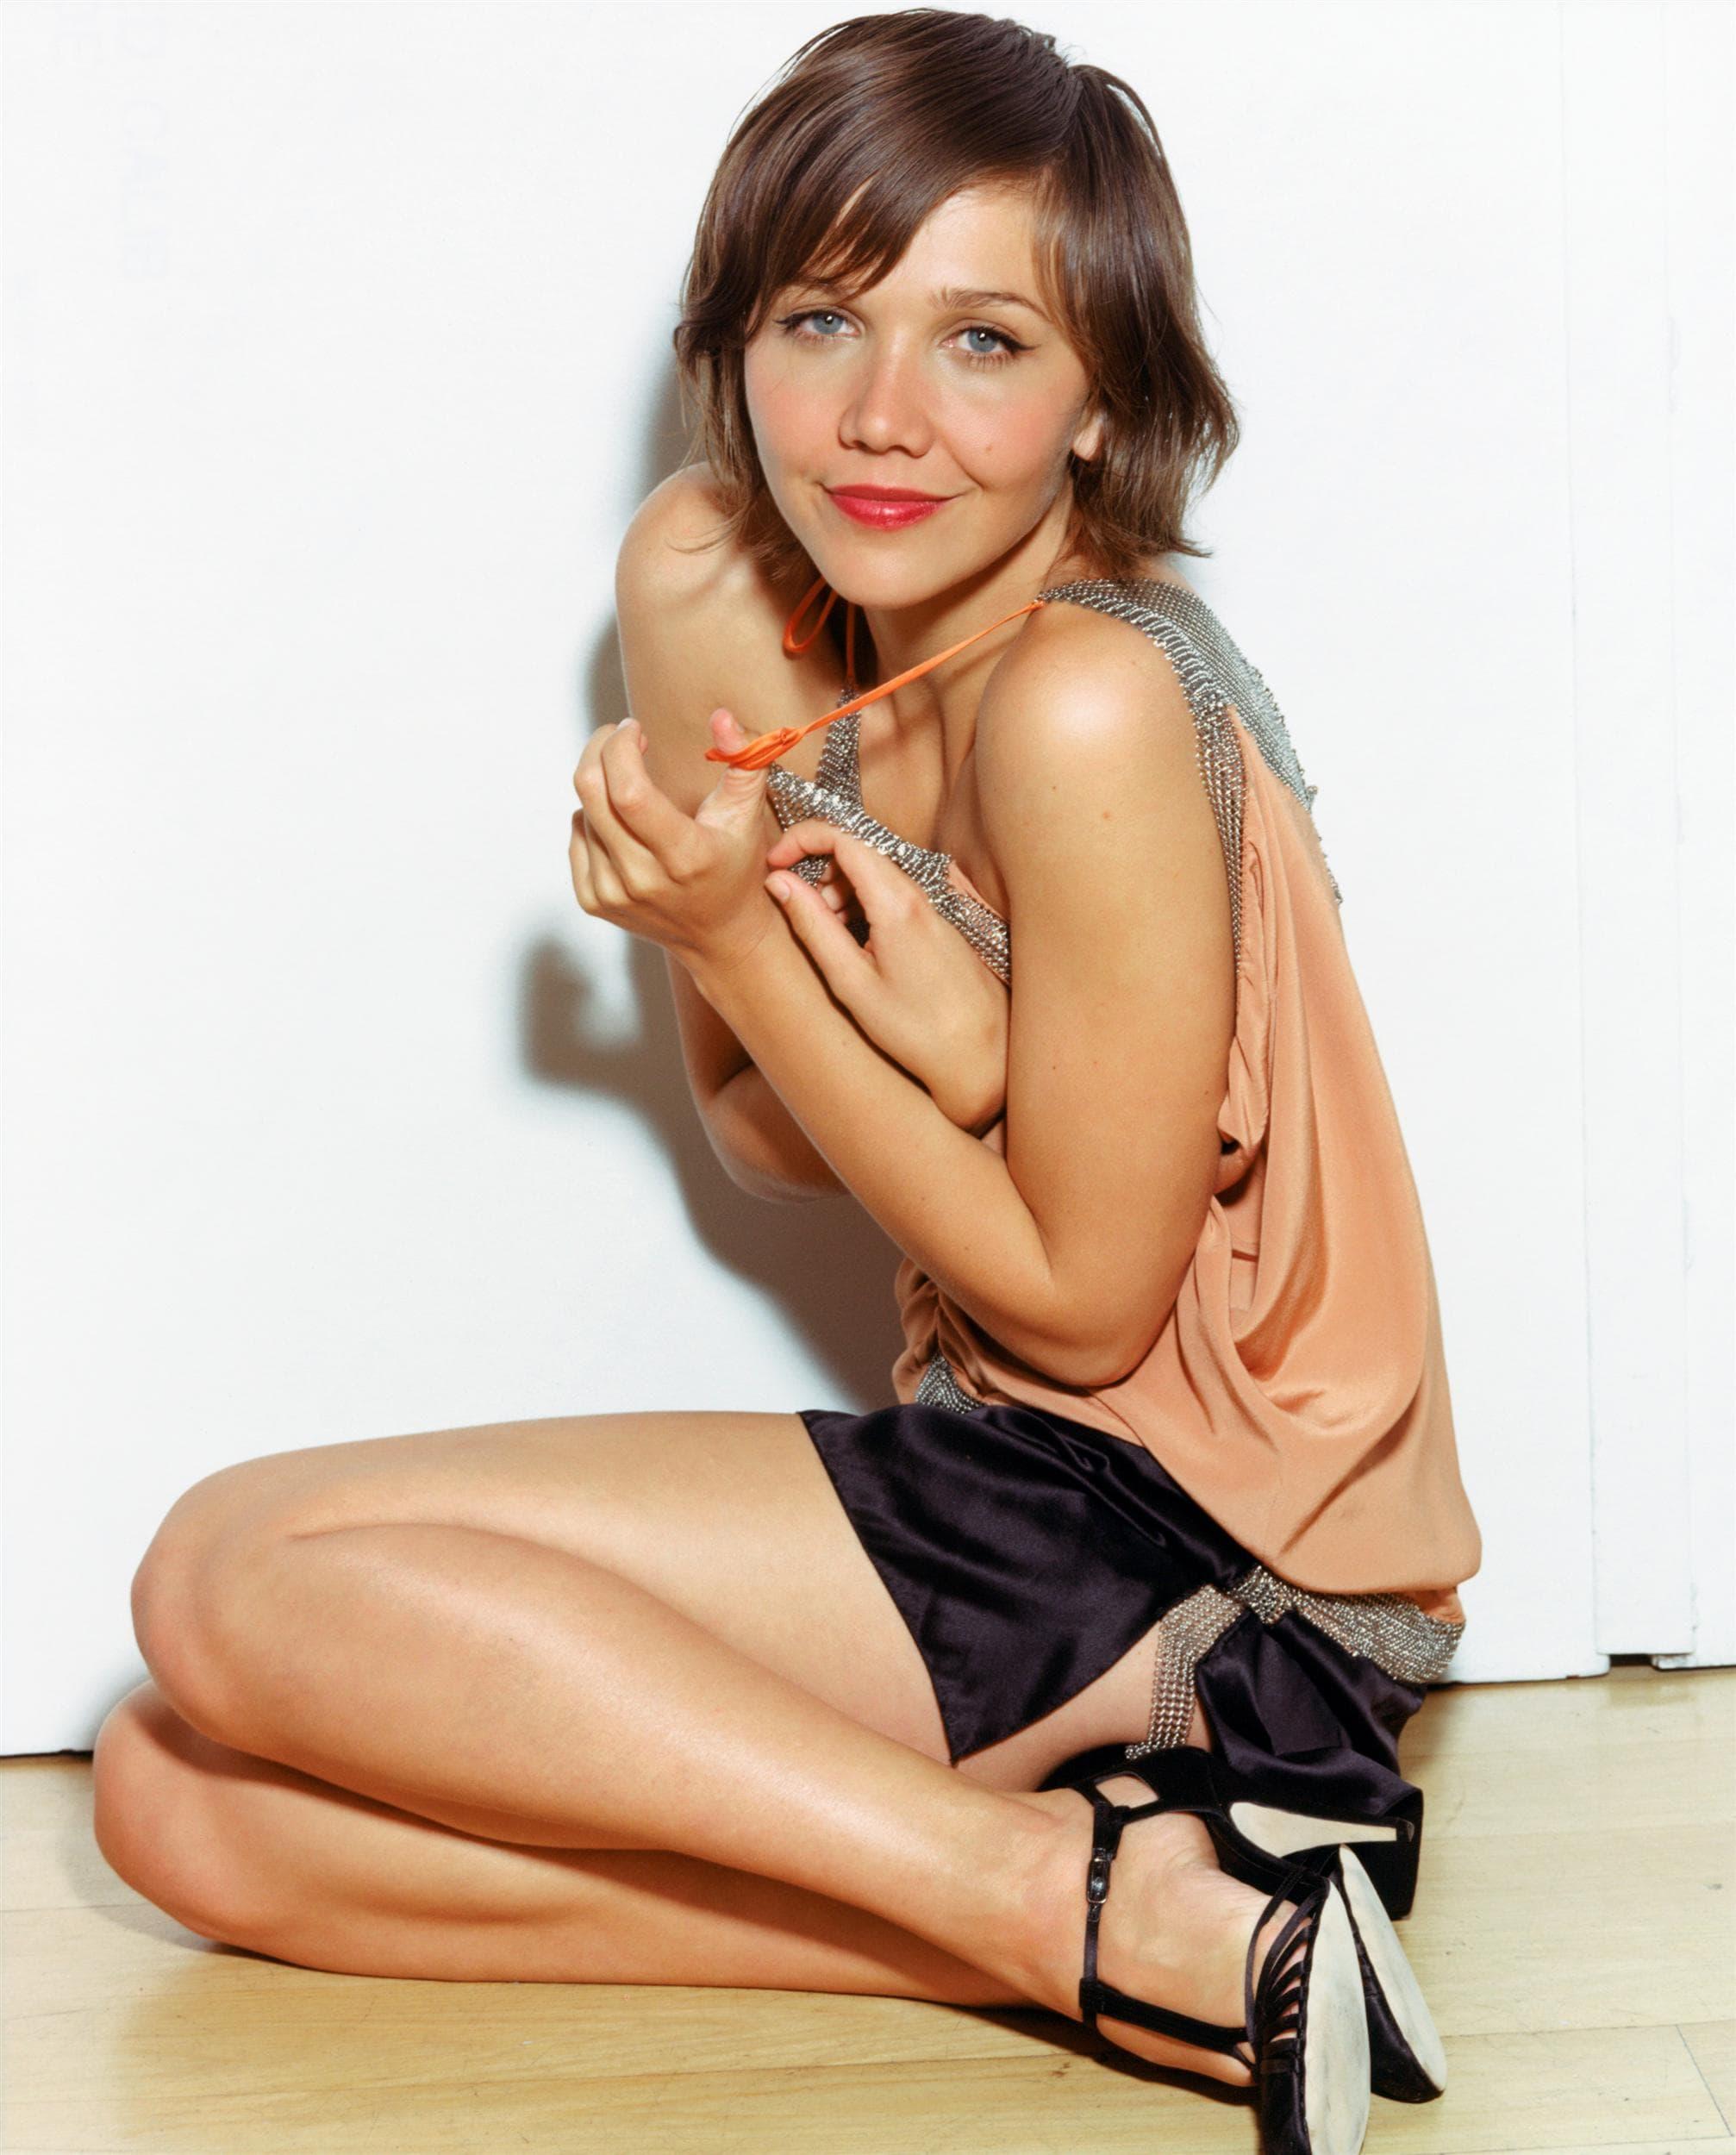 Maggie Gyllenhaal For mobile